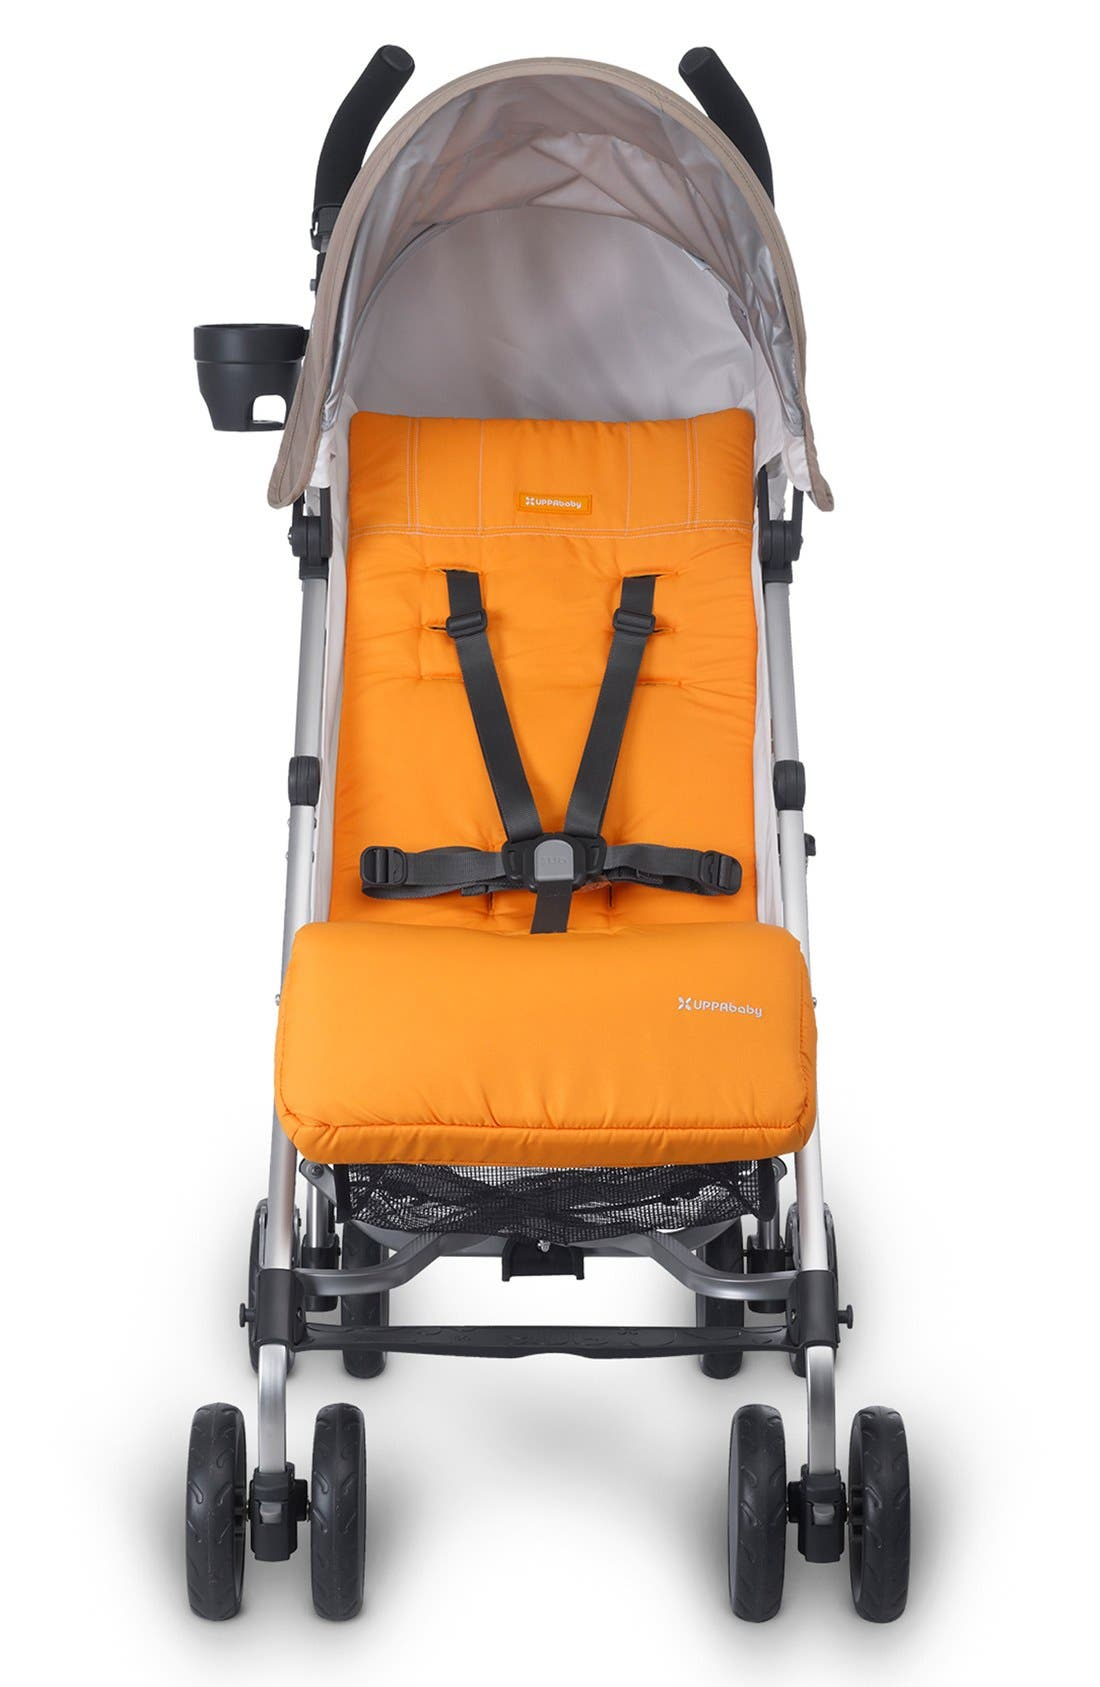 2015 G-LUXE - Aluminum Frame Reclining Umbrella Stroller,                             Alternate thumbnail 24, color,